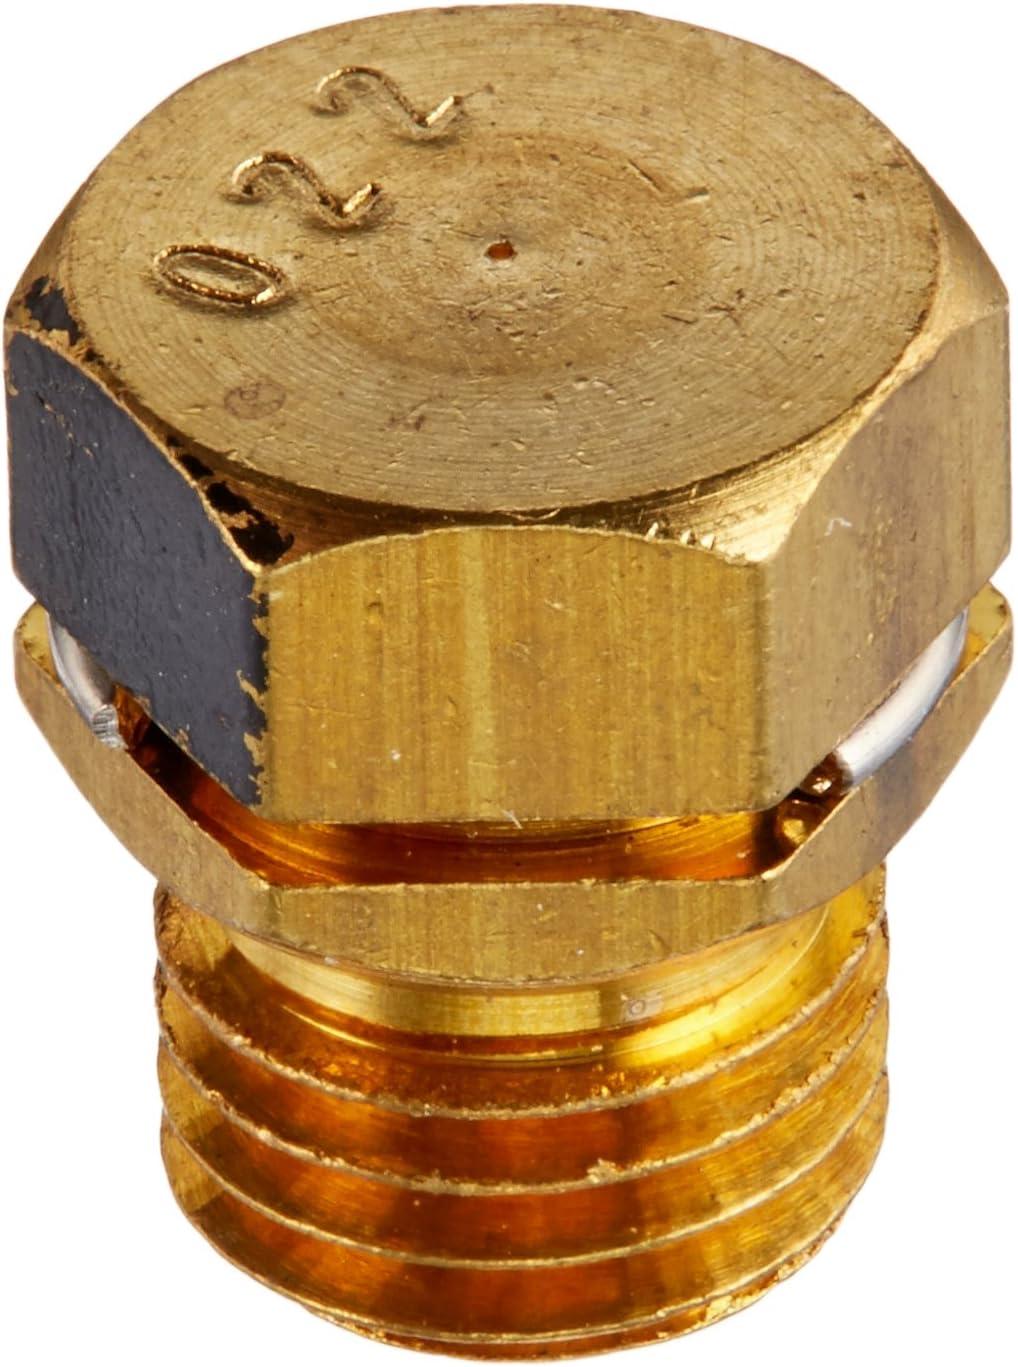 Frigidaire 318186925 Range//Stove//Oven Conversion Kit CE Sundberg